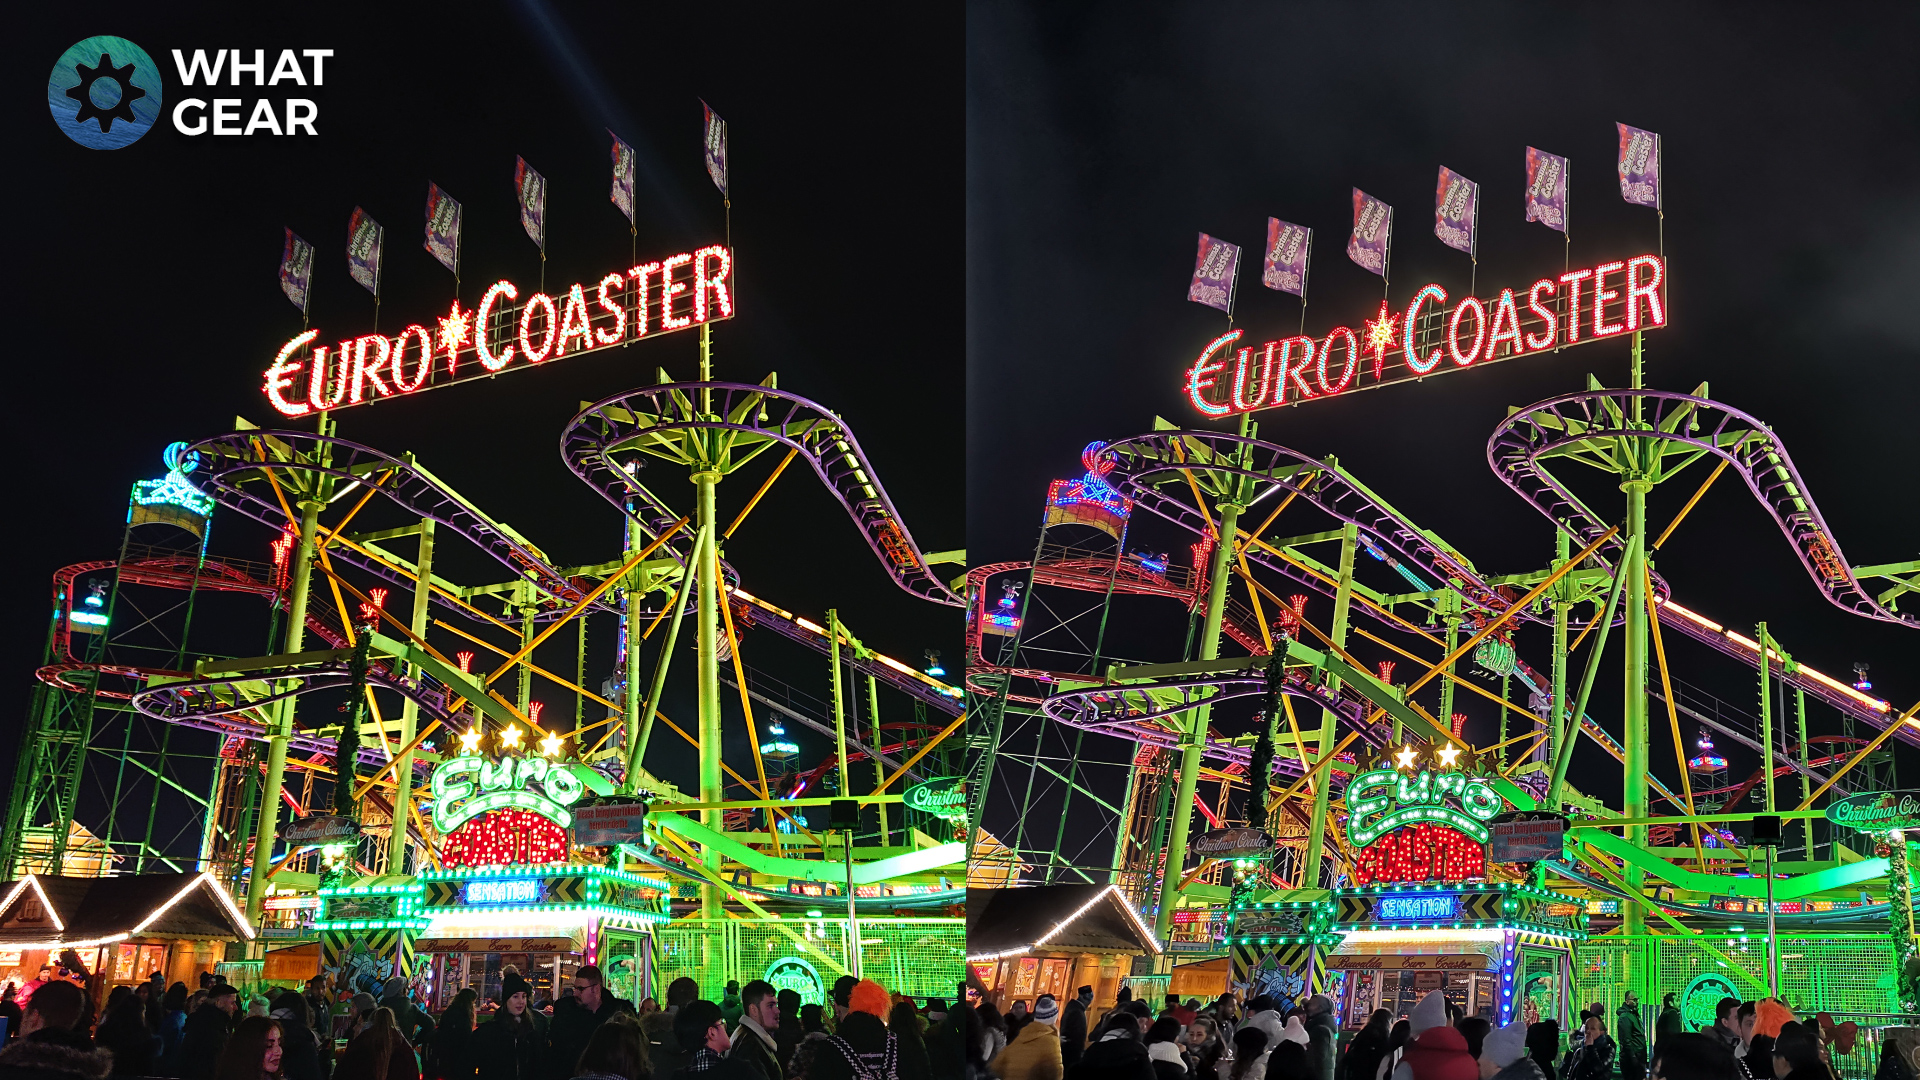 eurocoaster.jpg